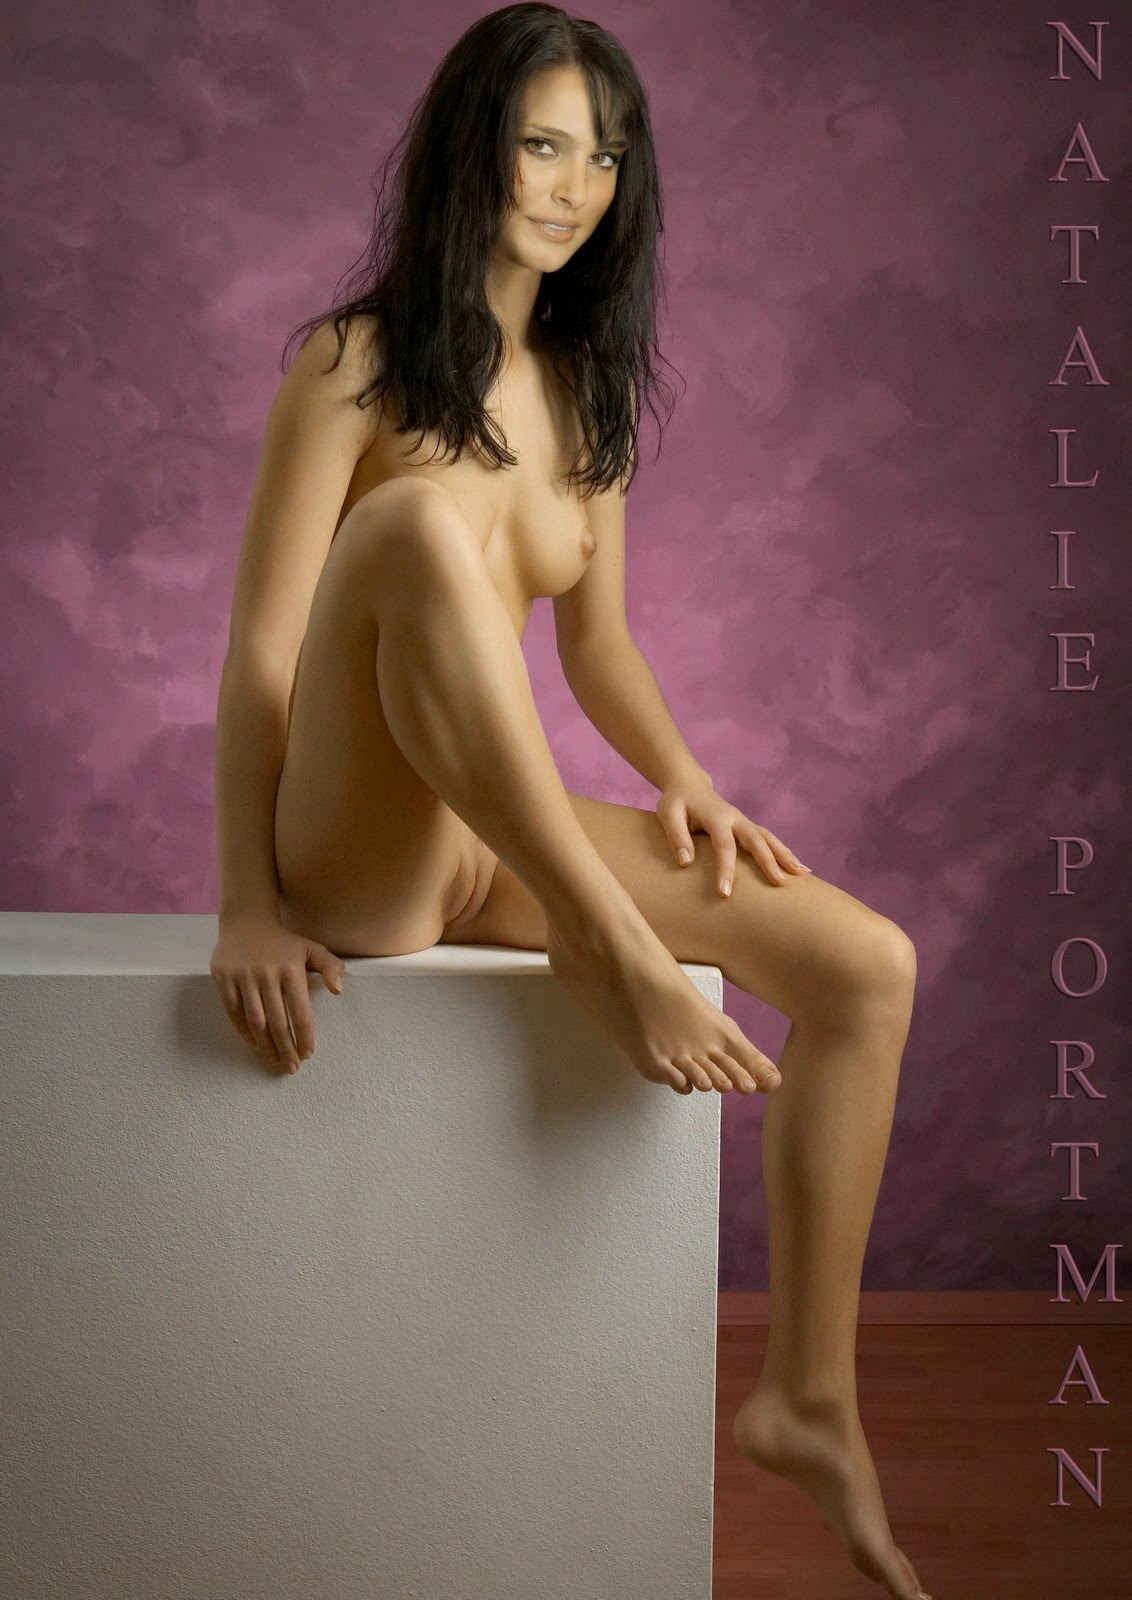 Natalie Portman Sexi Naked Pics  Topless Big Boobs-3858